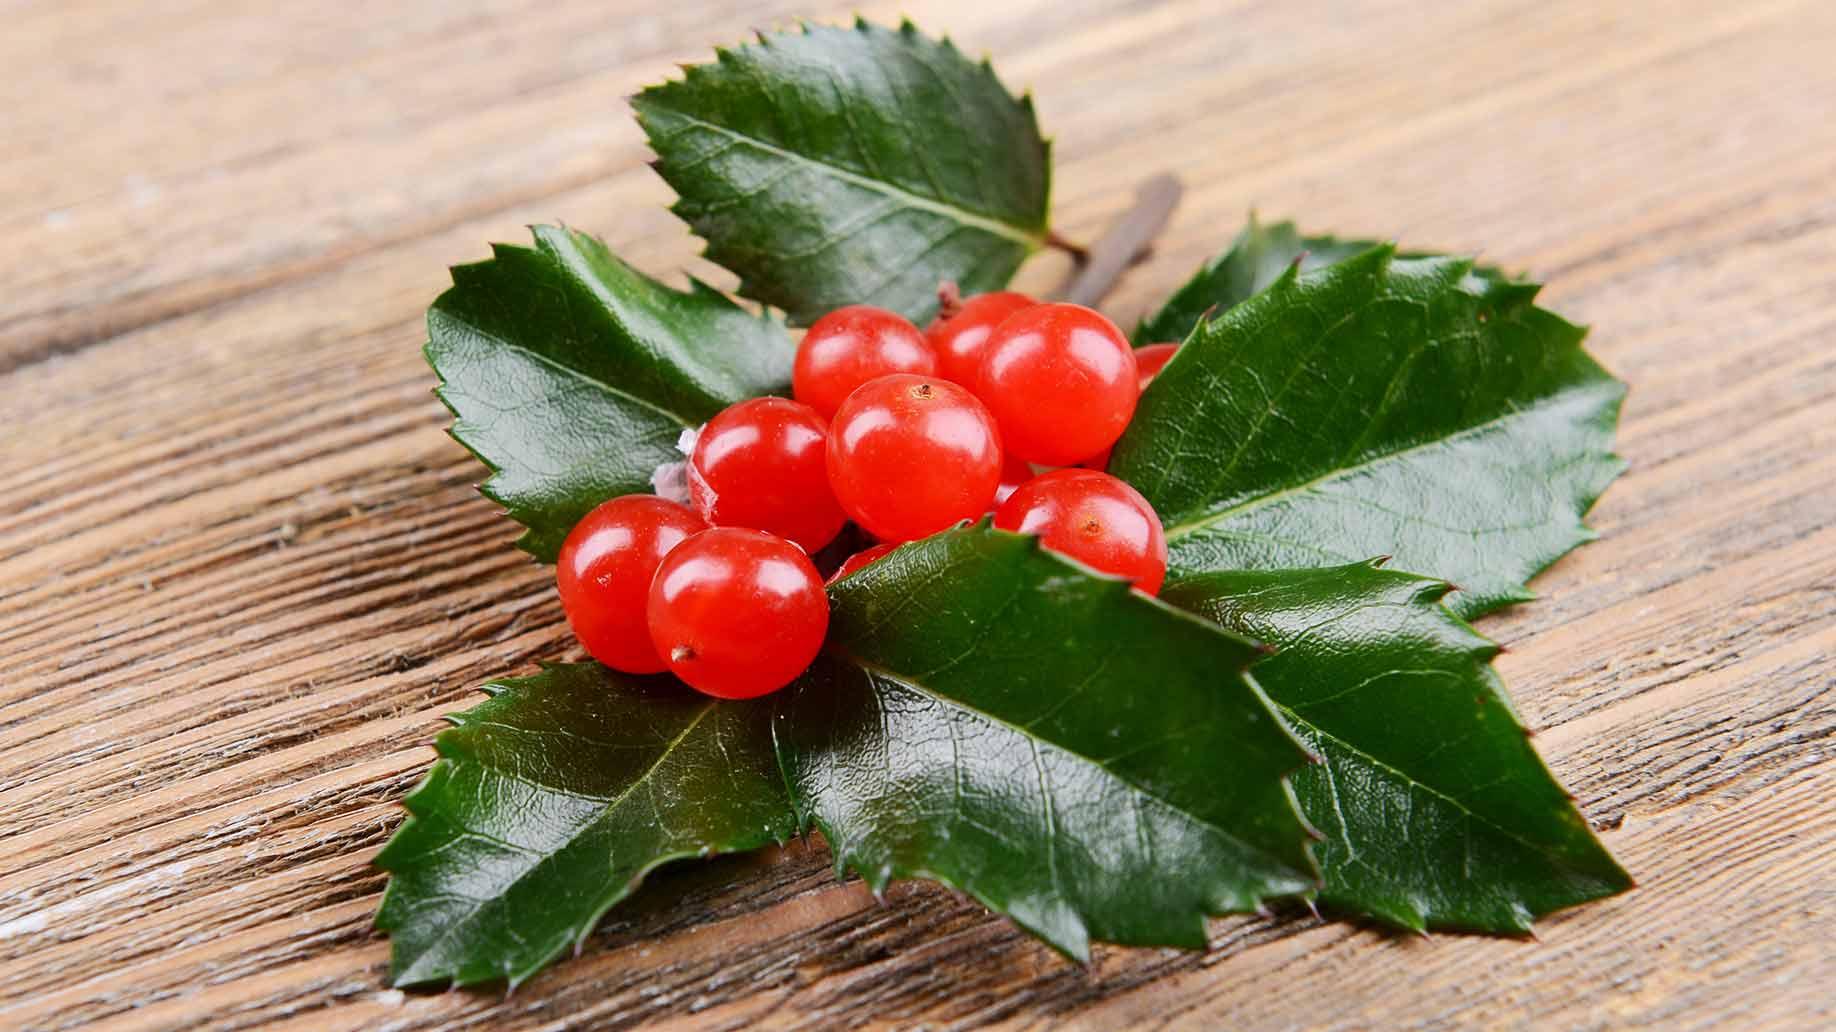 mistletoe herb red berries green leaves natural remedy lowers high blood pressure hypertension